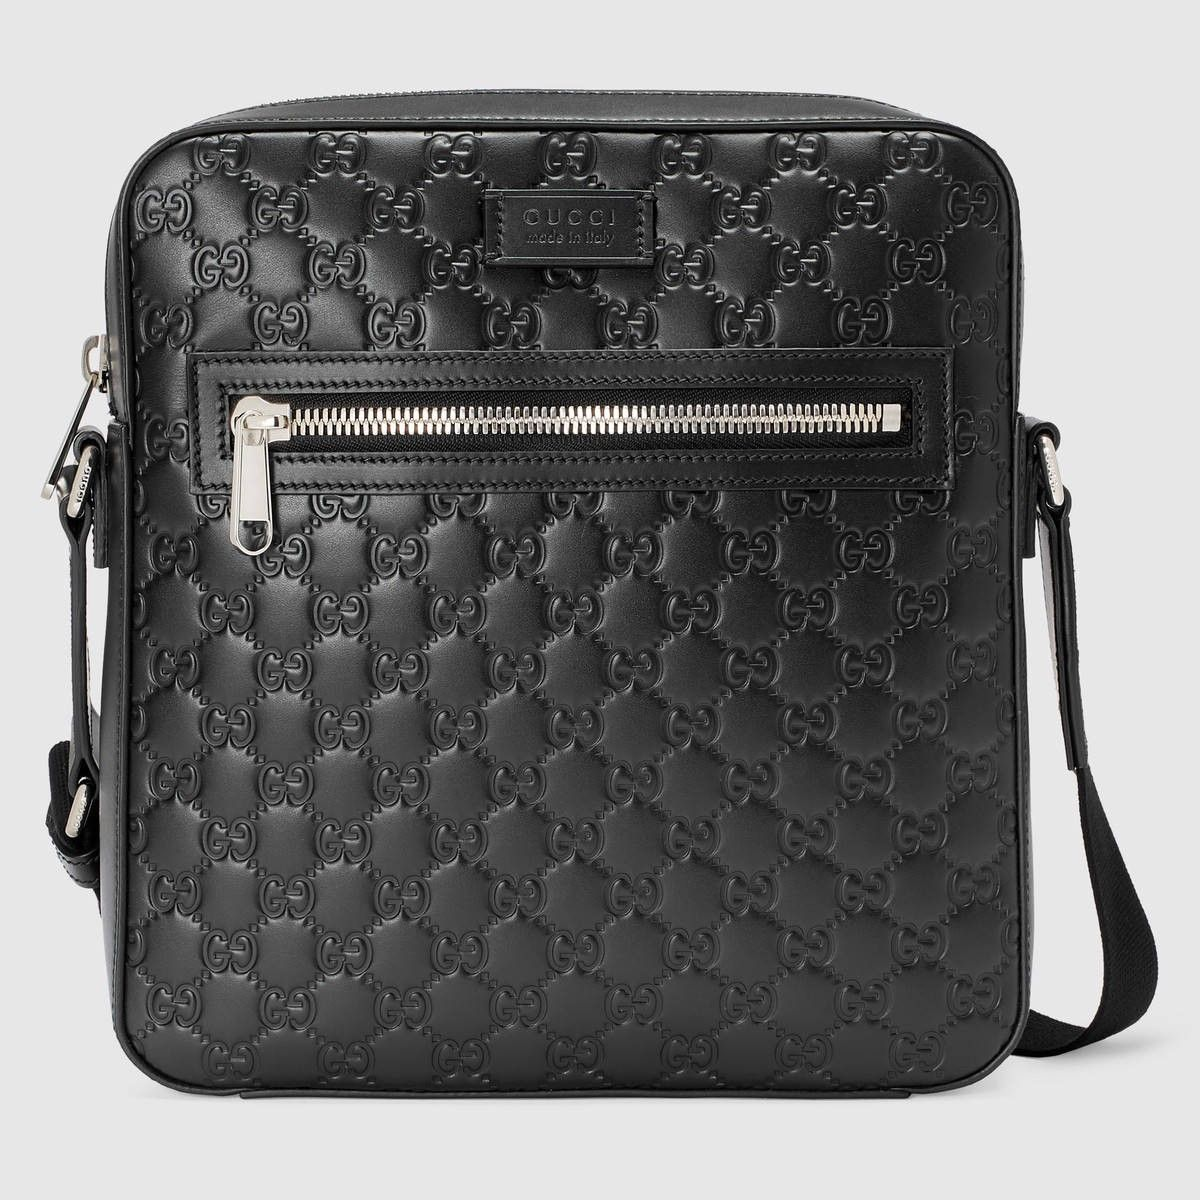 f3ab4765f2a2 GUCCI Gucci Signature Leather Flat Messenger - Black Gucci Signature. #gucci  #bags #shoulder bags #lining #nylon #suede #